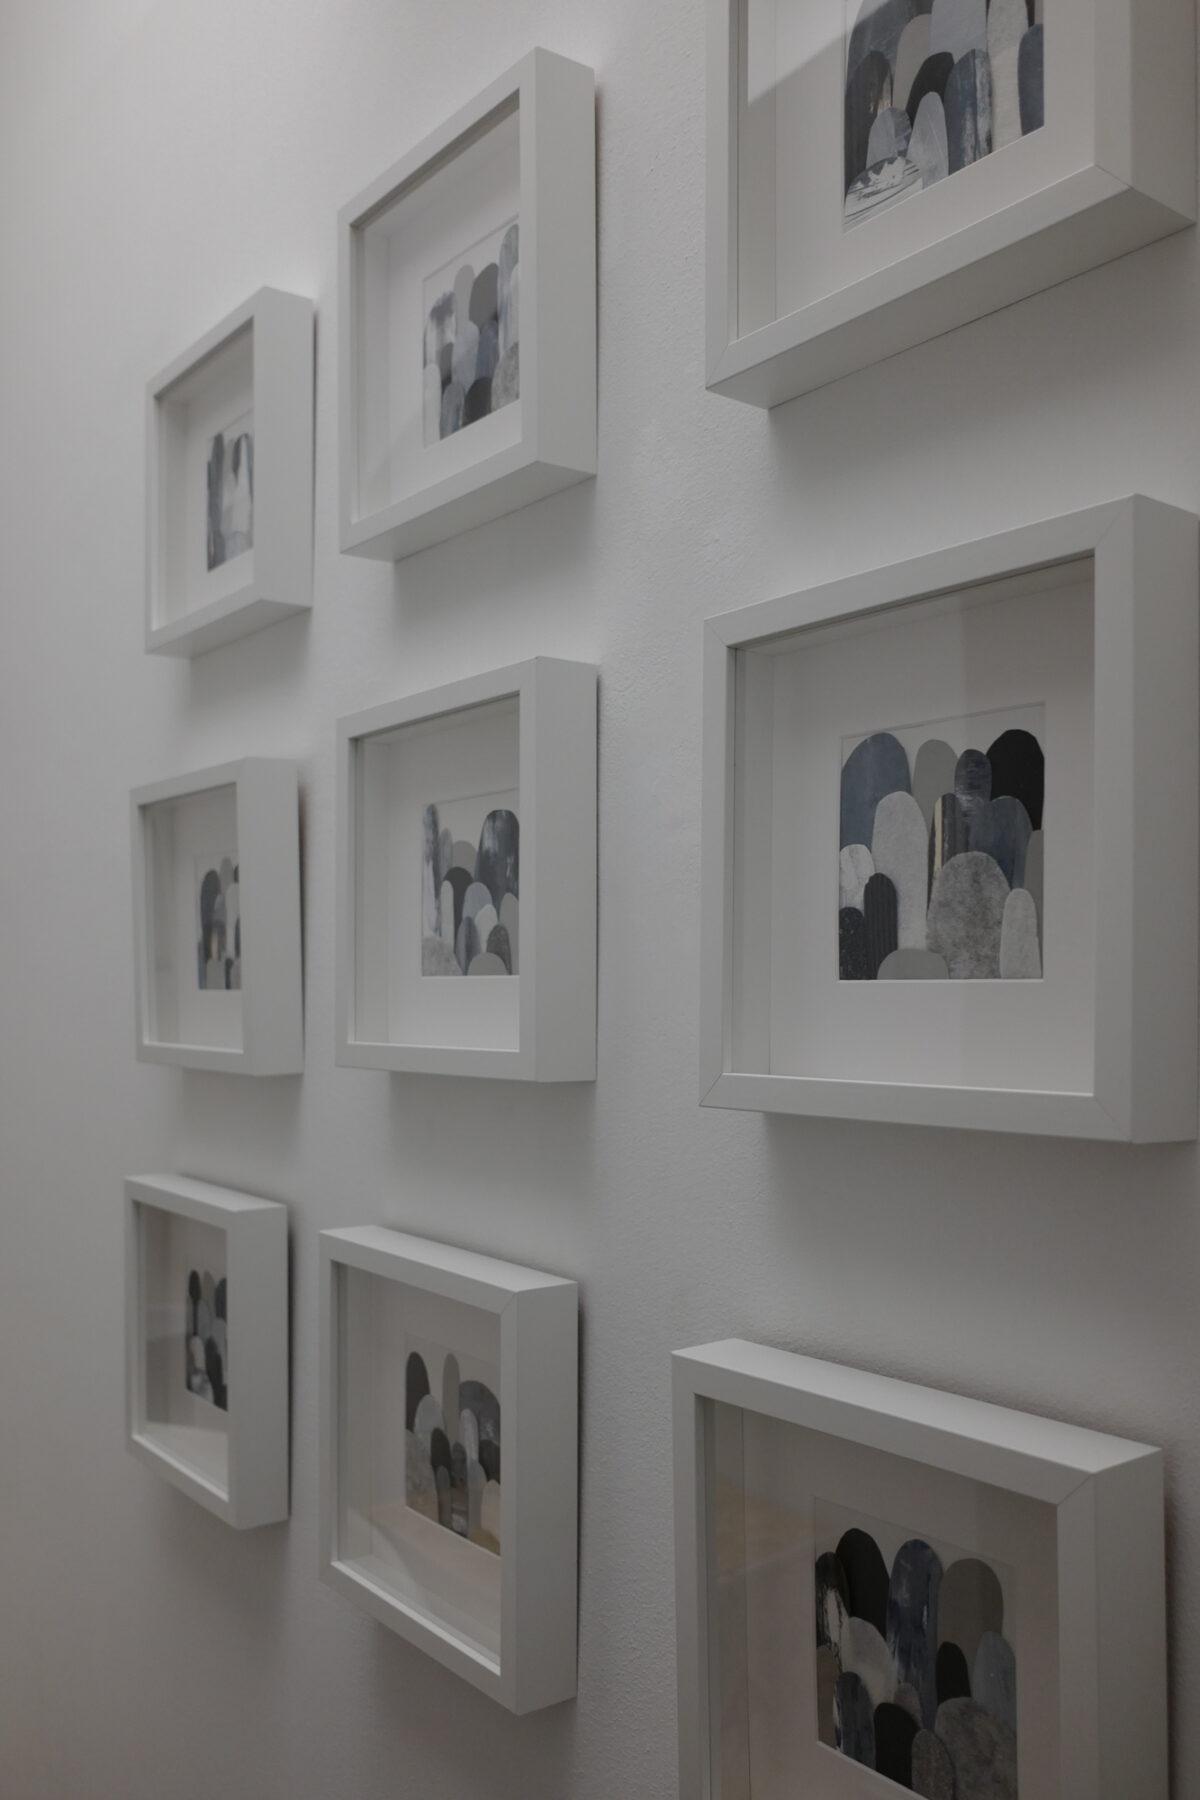 212 gallery-5